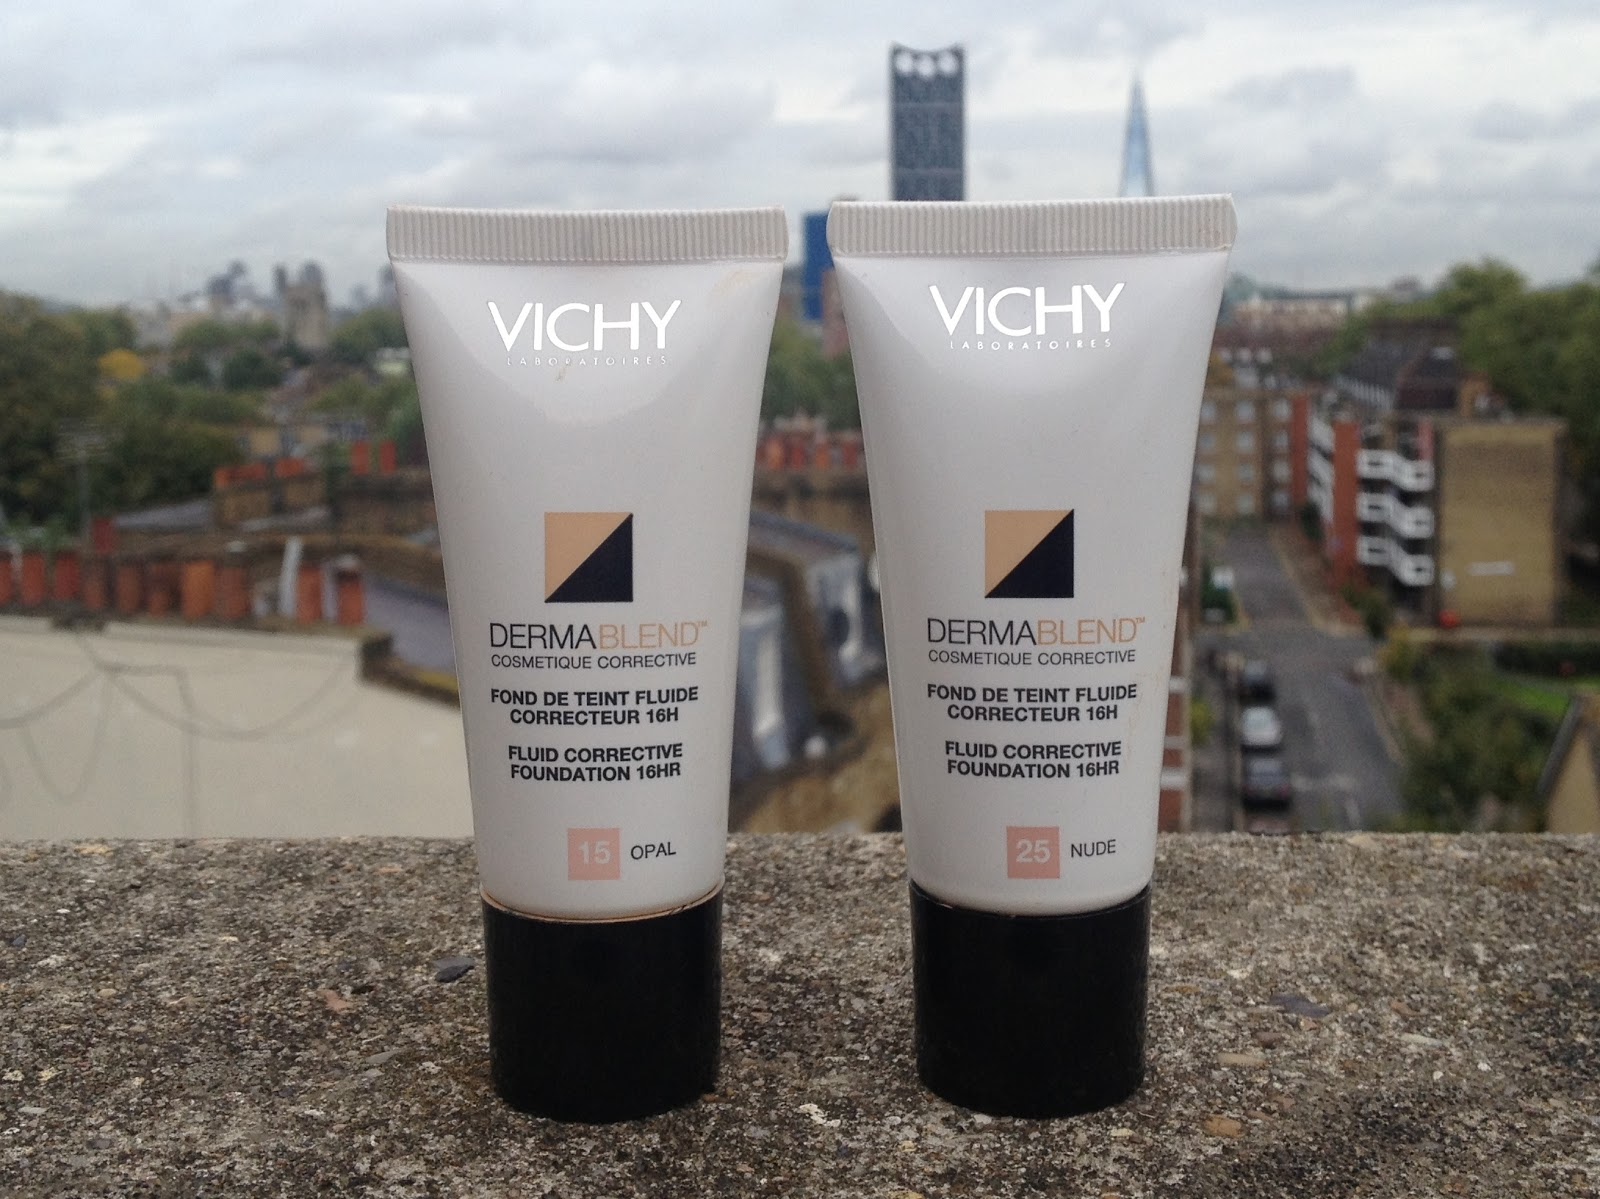 Ritira gratis in farmacia Vichy Dermablend